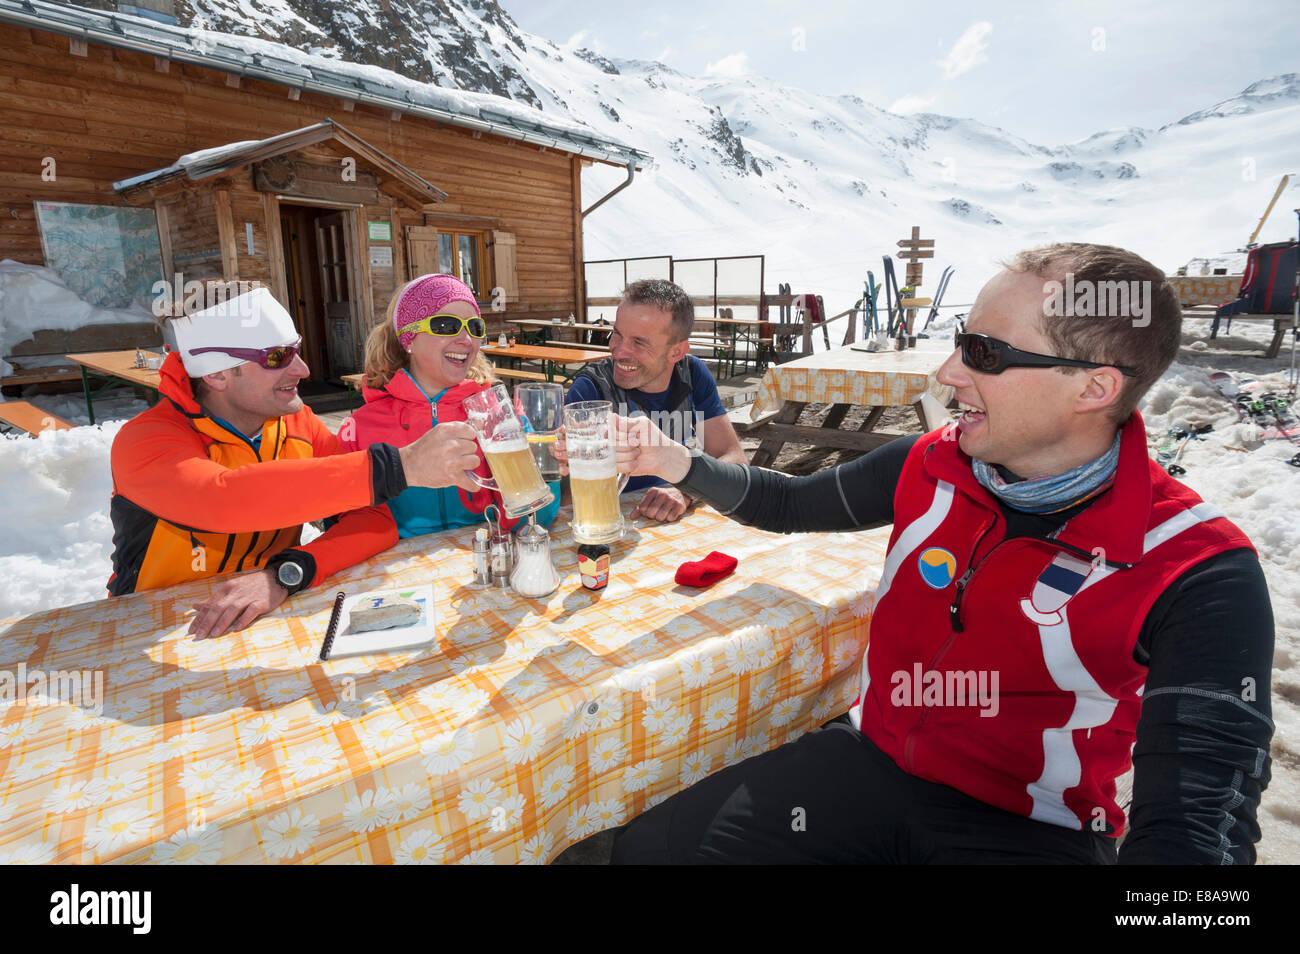 Gruppo cabina sciatori pranzo birra neve invernale Immagini Stock